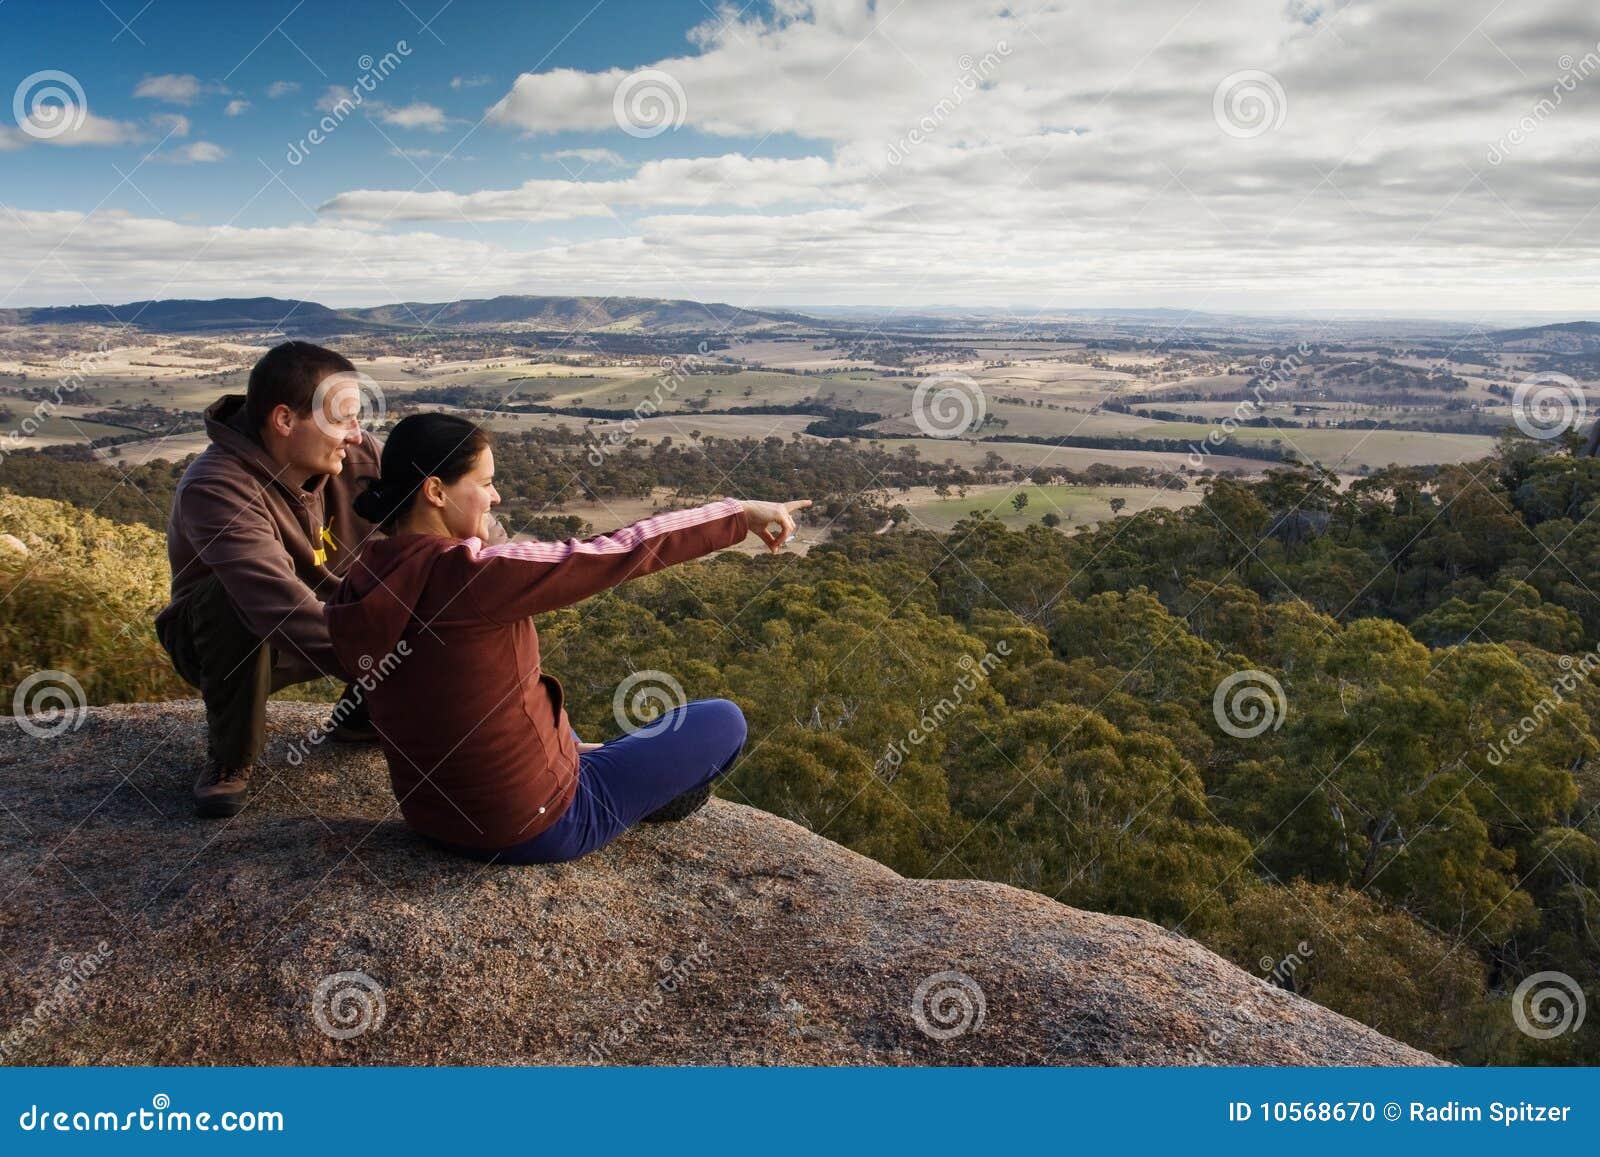 Couple of a tourists